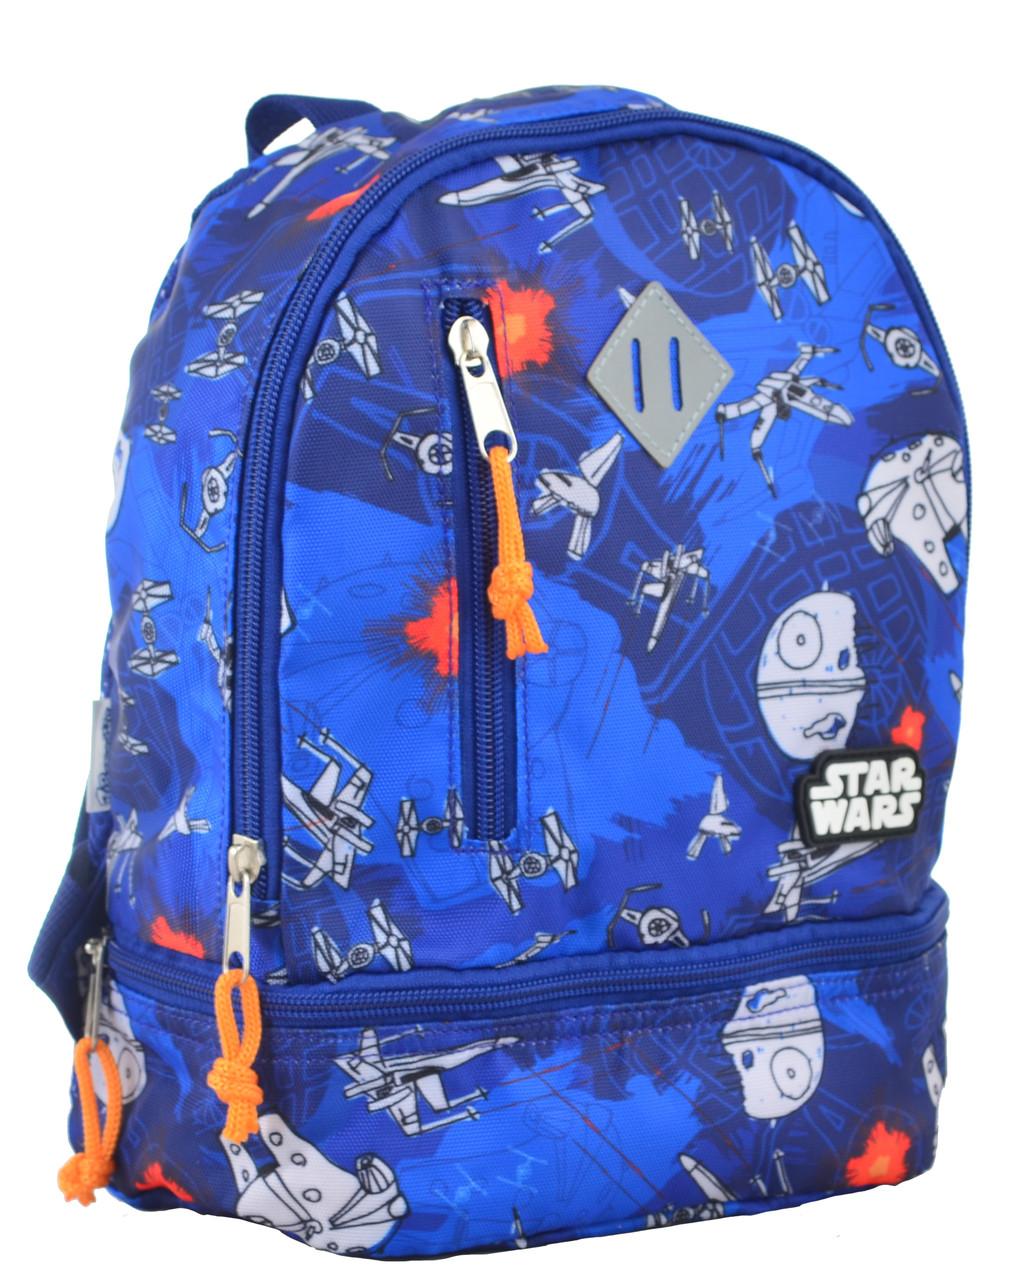 Рюкзак детский K-21 Star Wars, 27*21.5*11.5